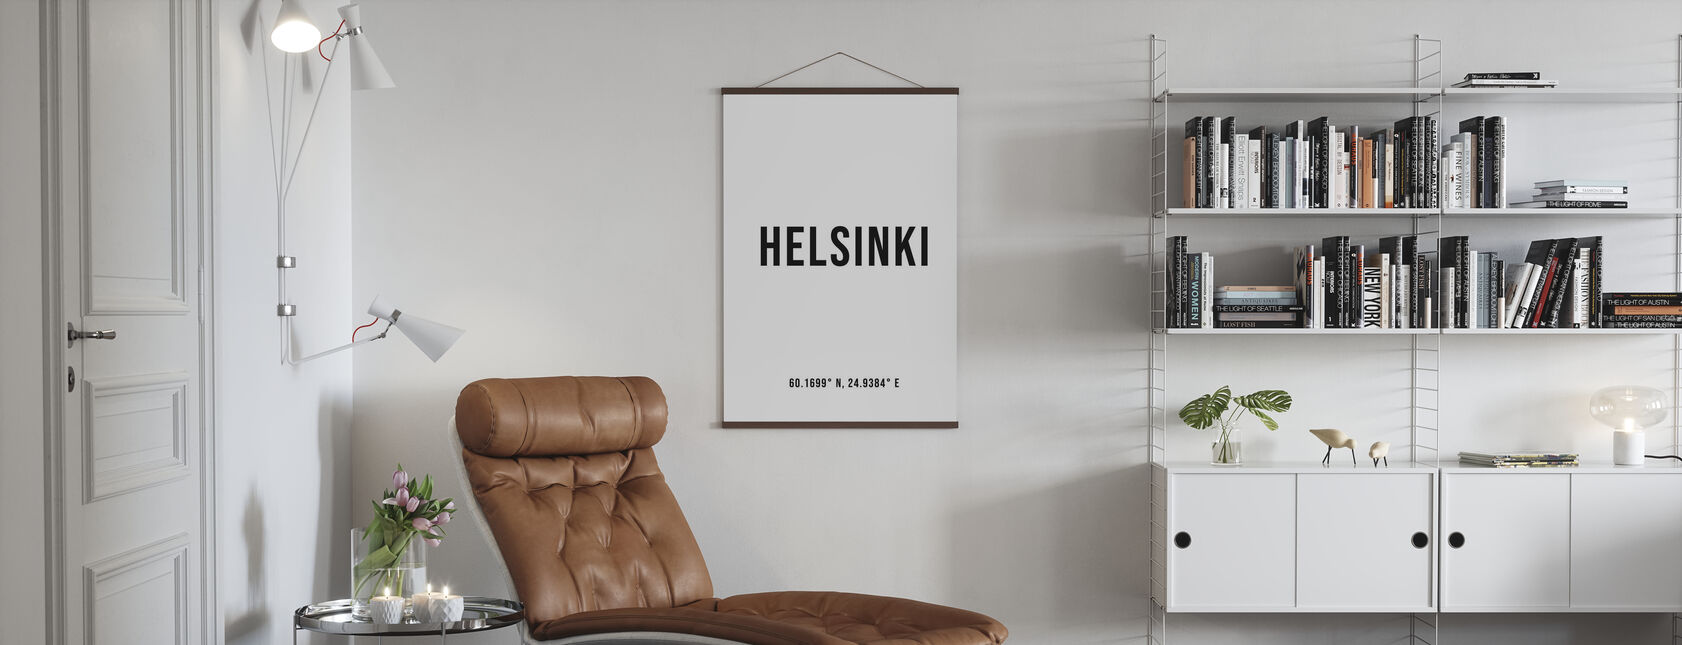 Helsinki Coordenadas - Póster - Salón